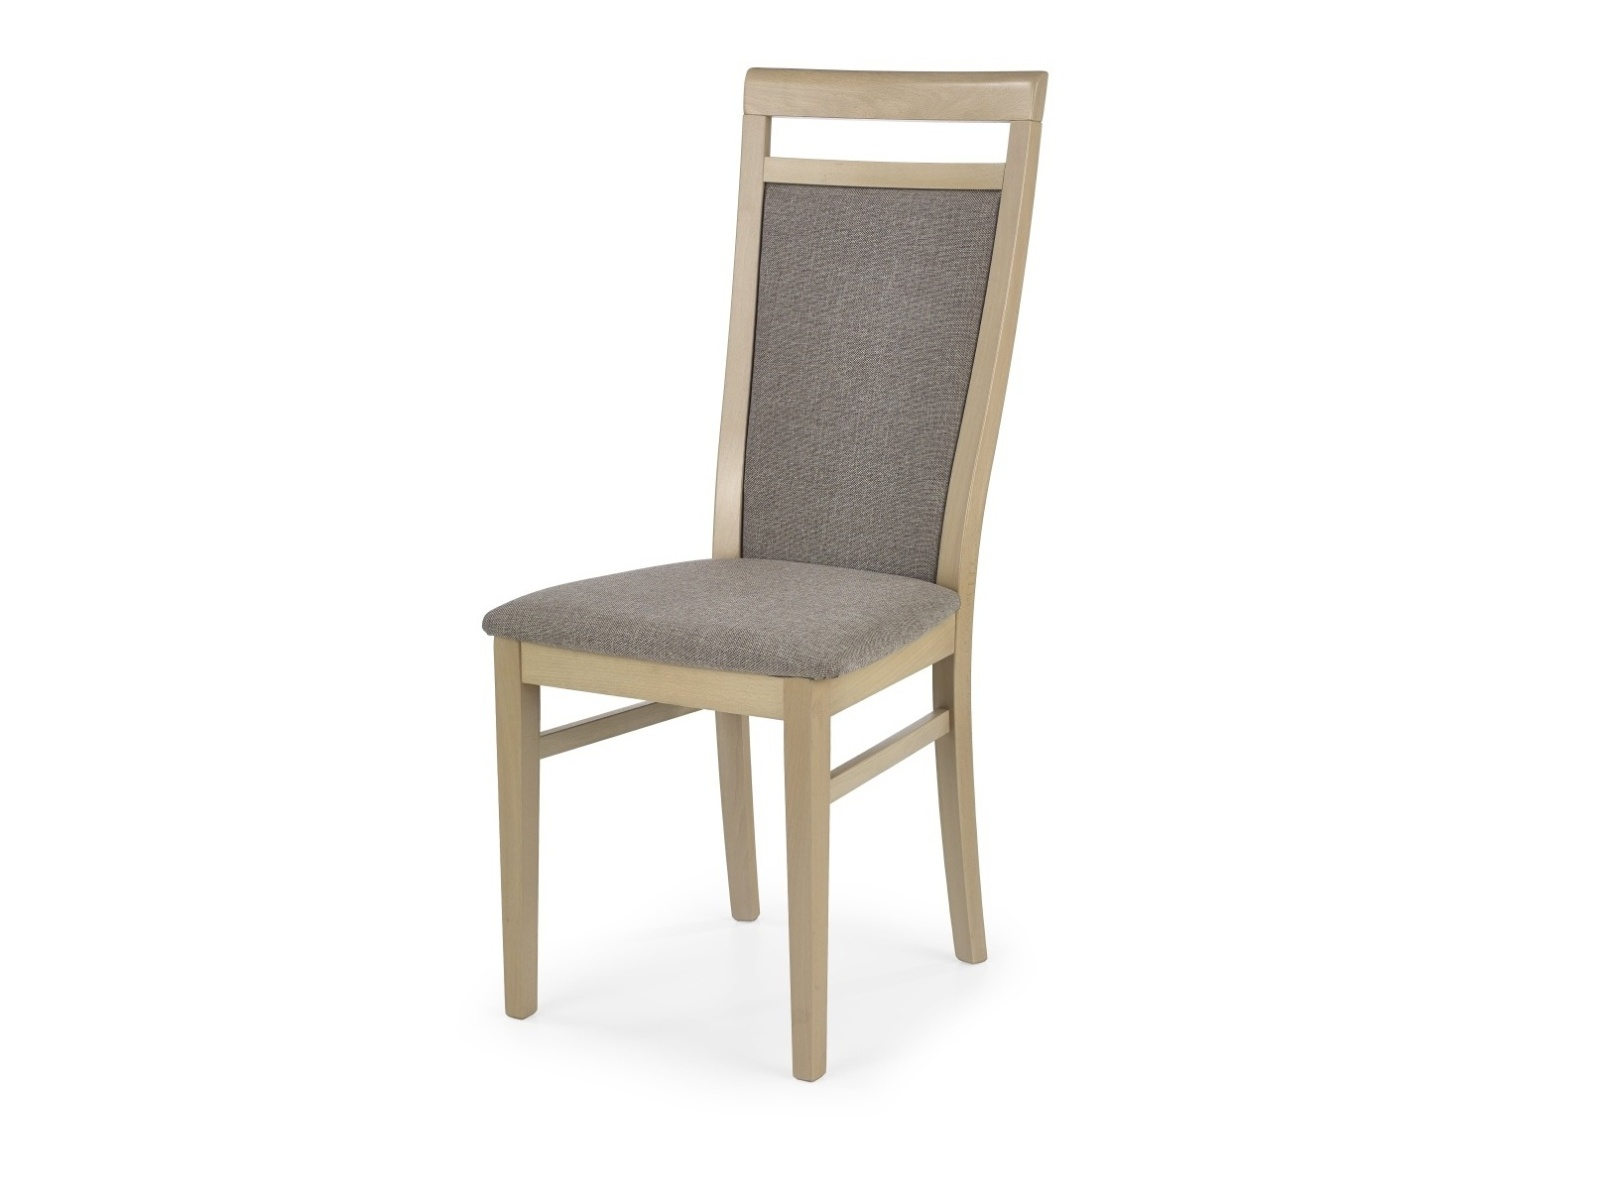 Halmar Jídelní židle DAMIAN, dub sonoma